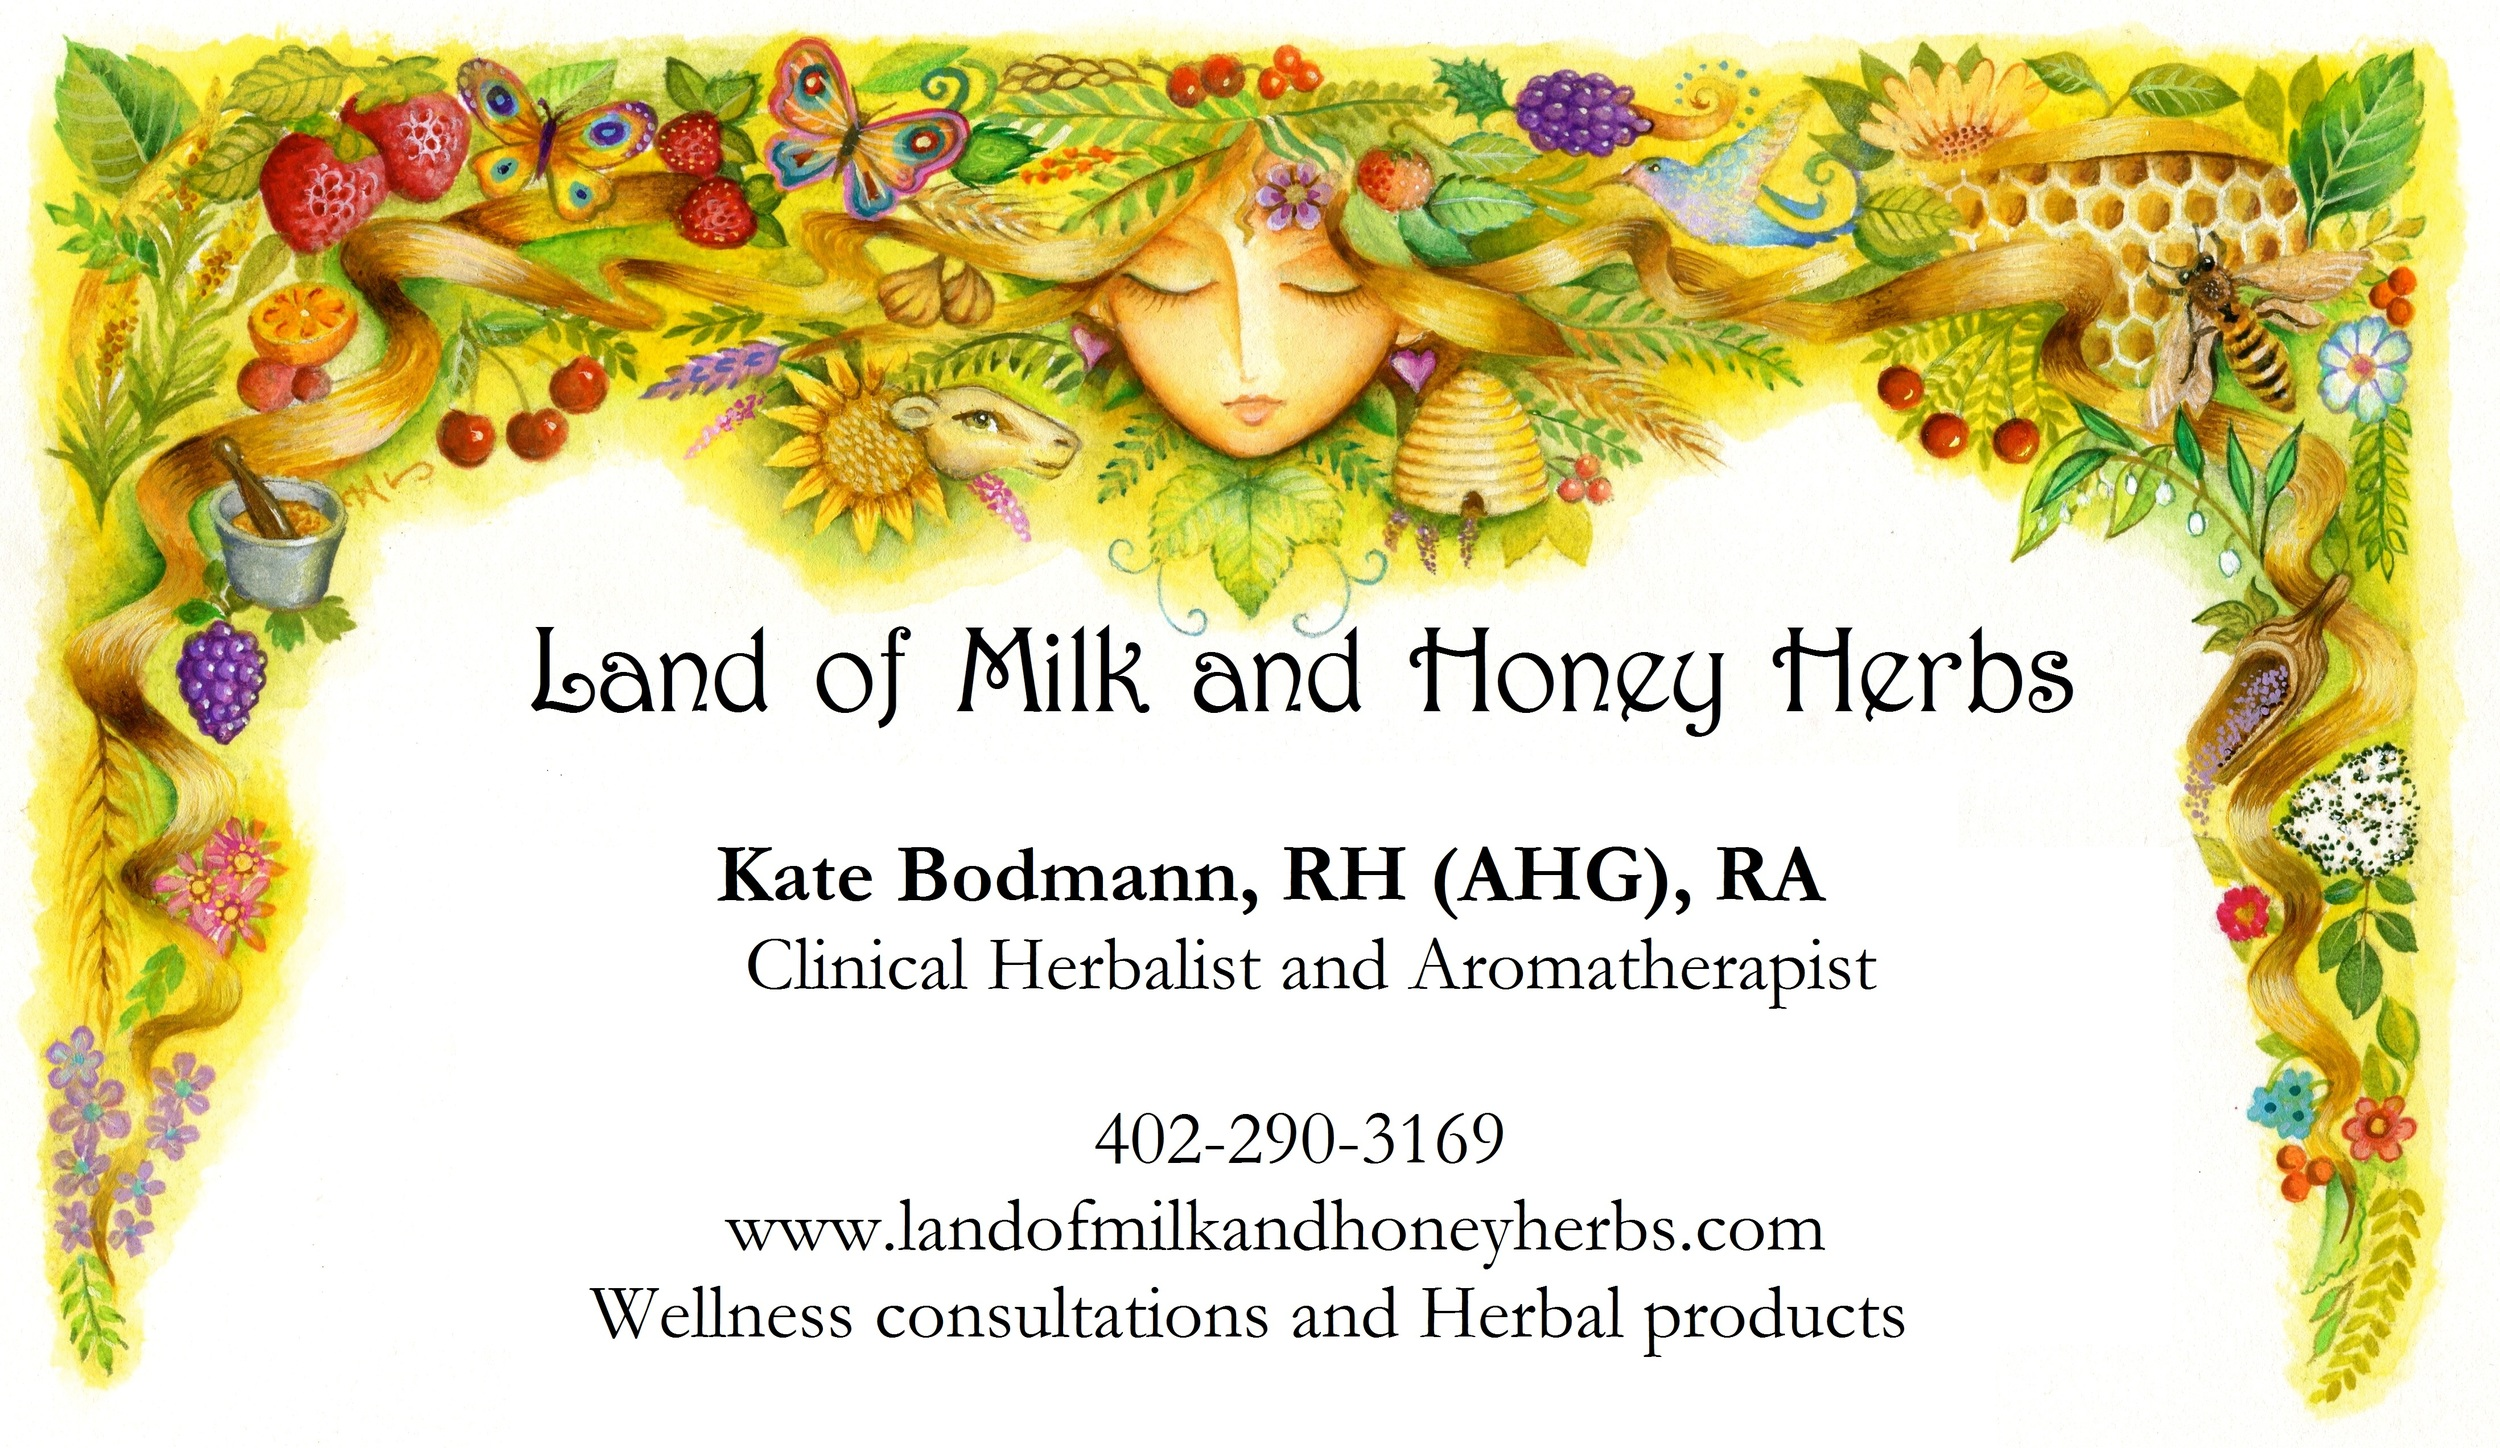 KATE BODMANN, Clinical Herbalist RH (AHG) — OMAHA WHOLE LIVING